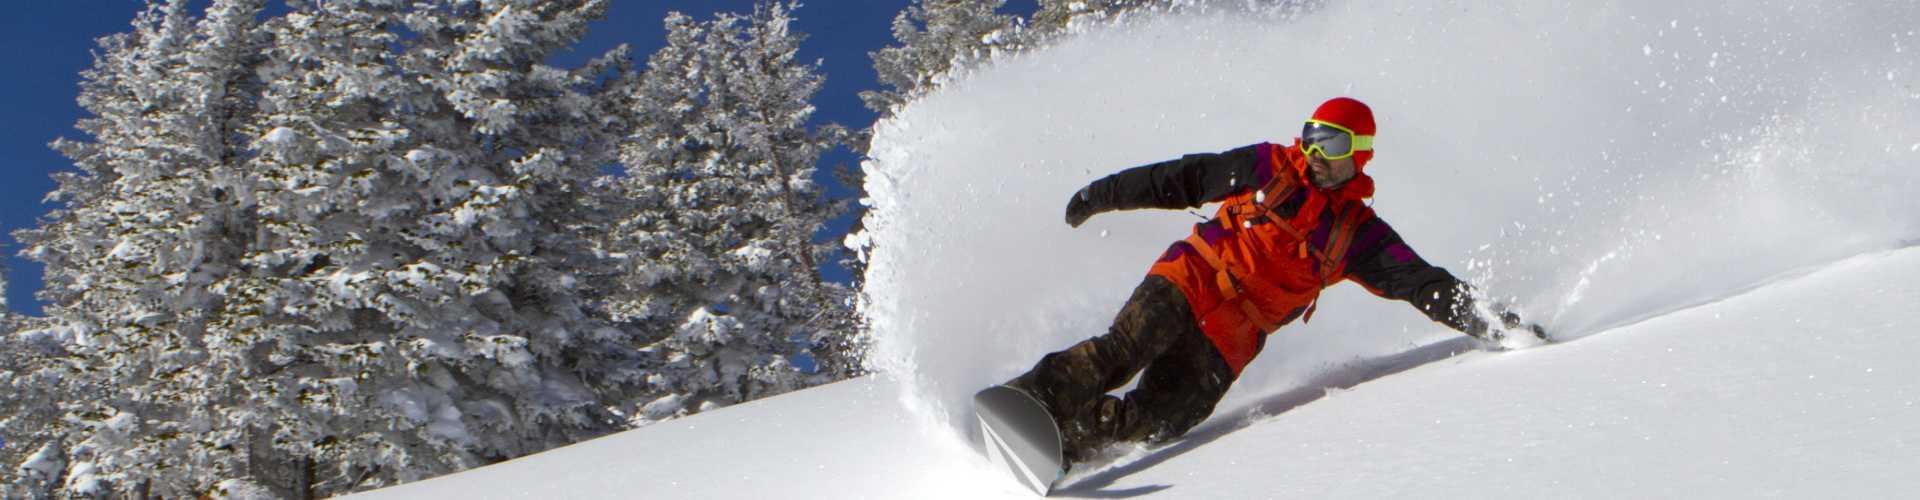 Skiurlaub unter Freunden